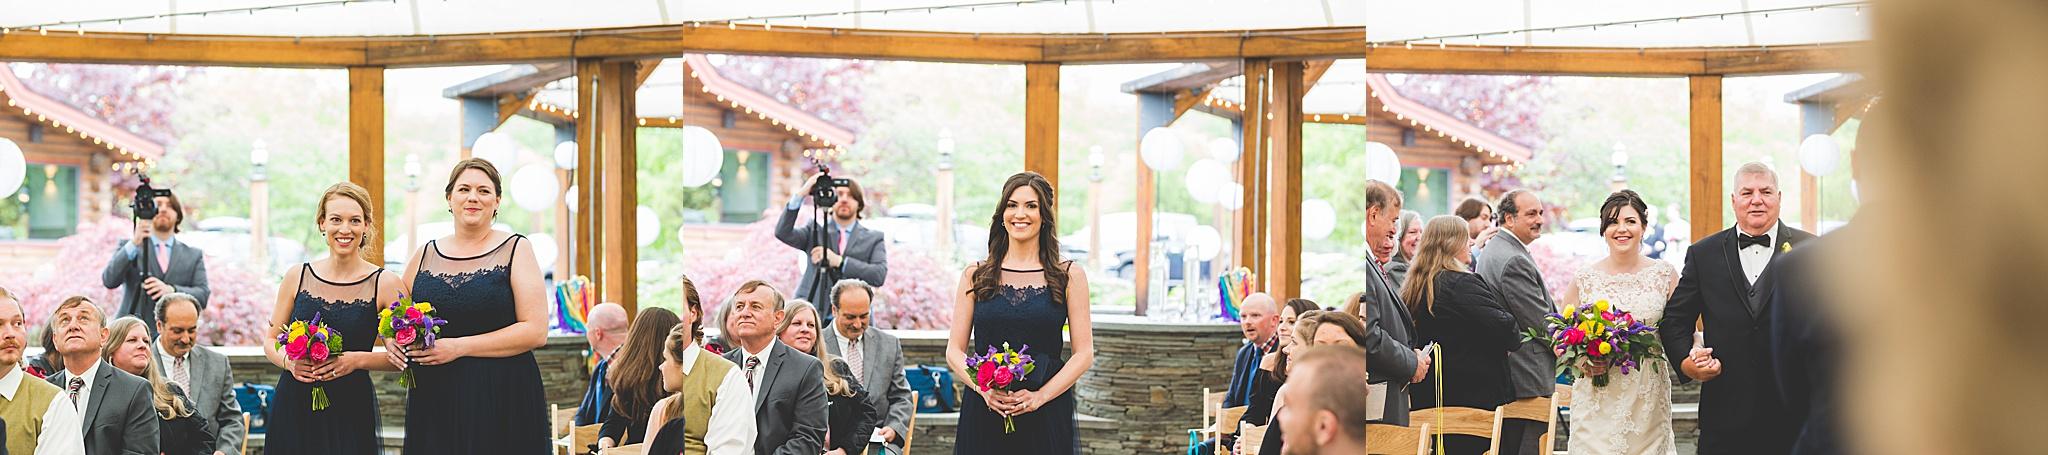 Albany_Wedding_Photographer_7365.jpg